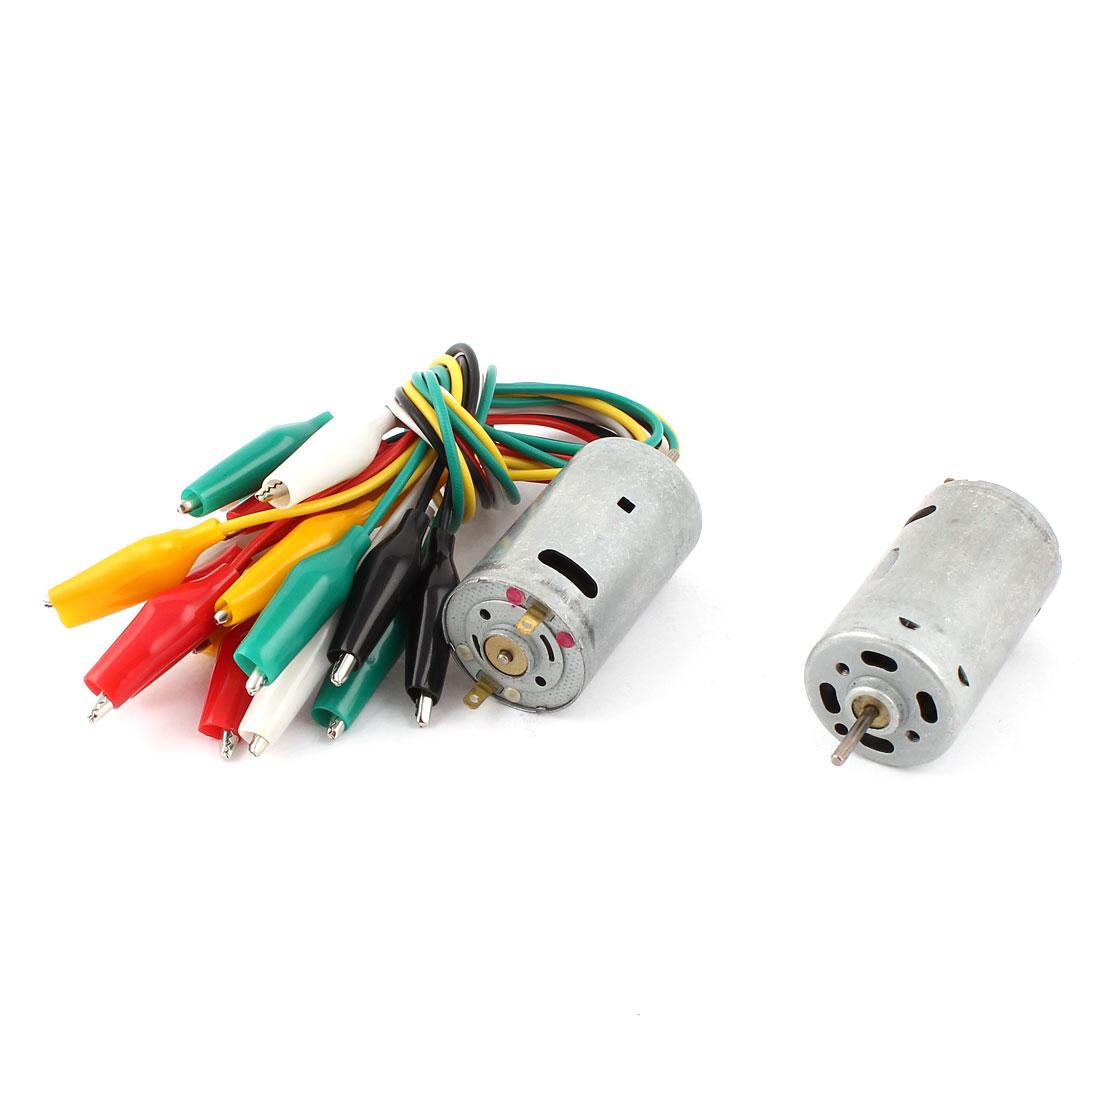 2 Pcs Electric Mini Motor 9000-15000RPM DC 6-12V + 10 Pieces Alligator Clip Wire